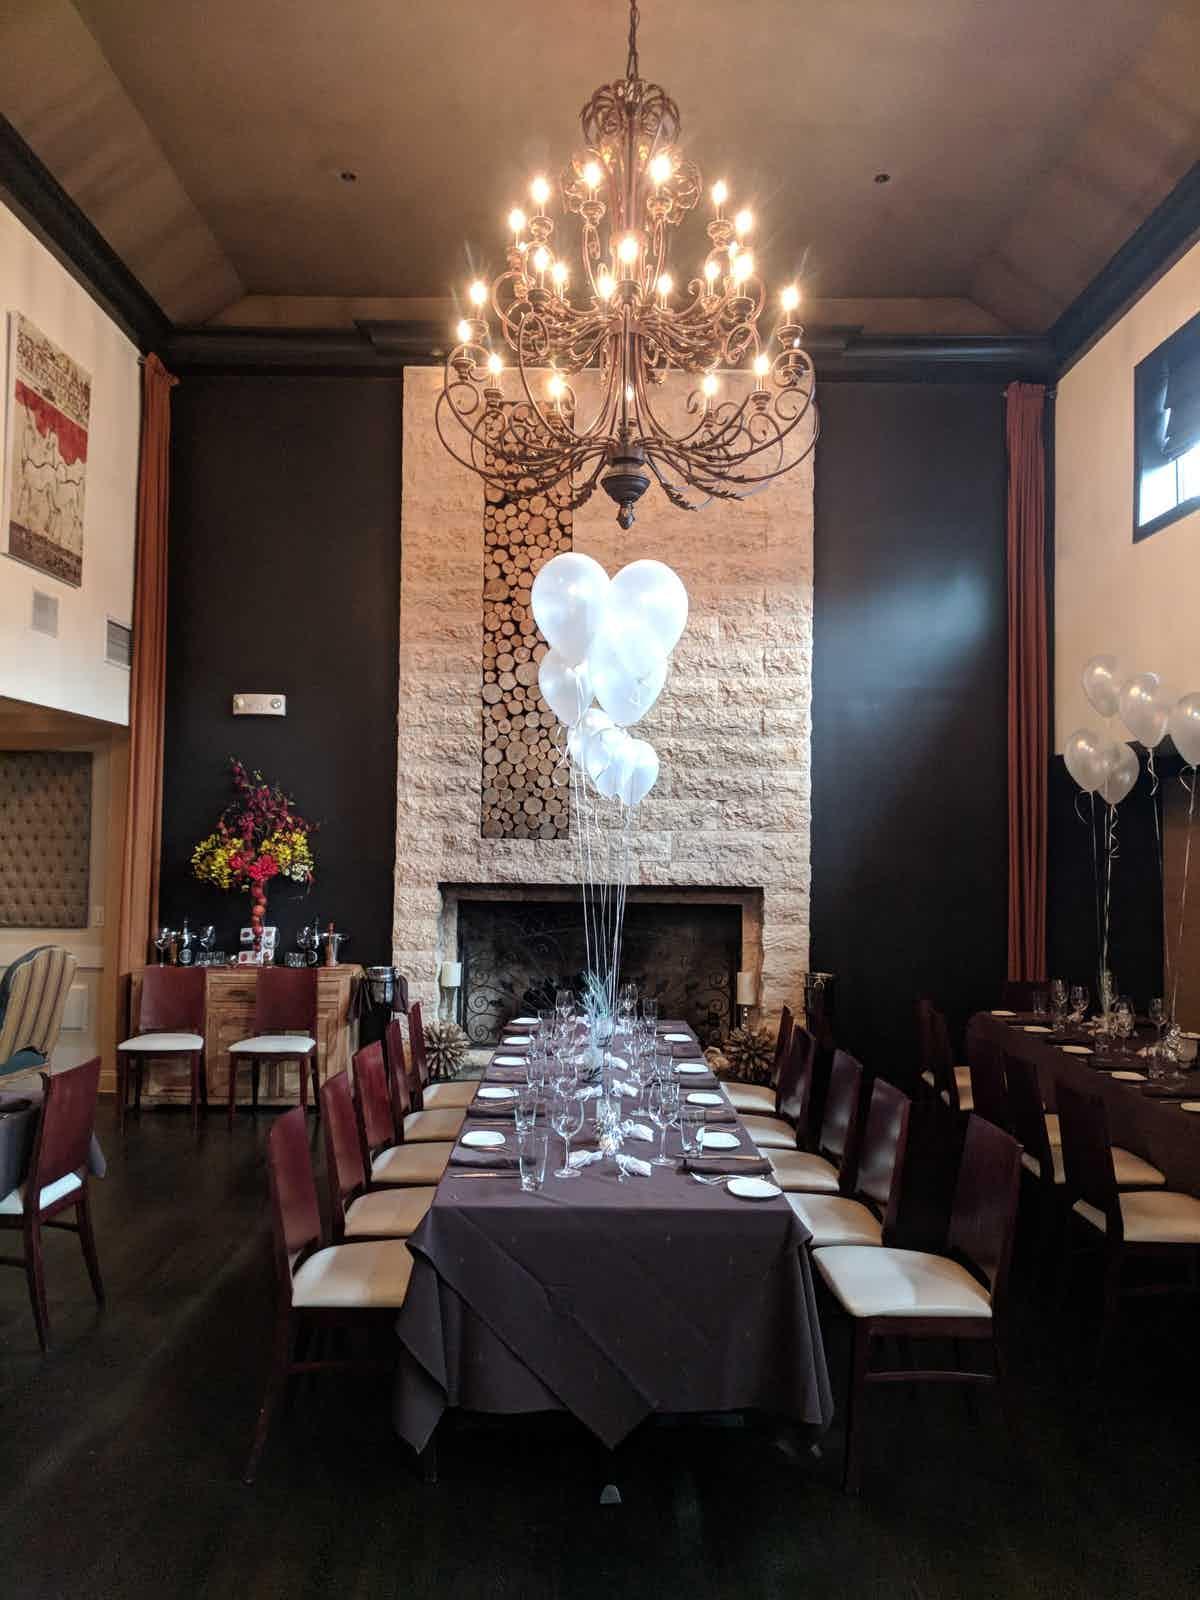 Charmant Lithos Estiatorio   Livingston | Restaurant Review   Zagat